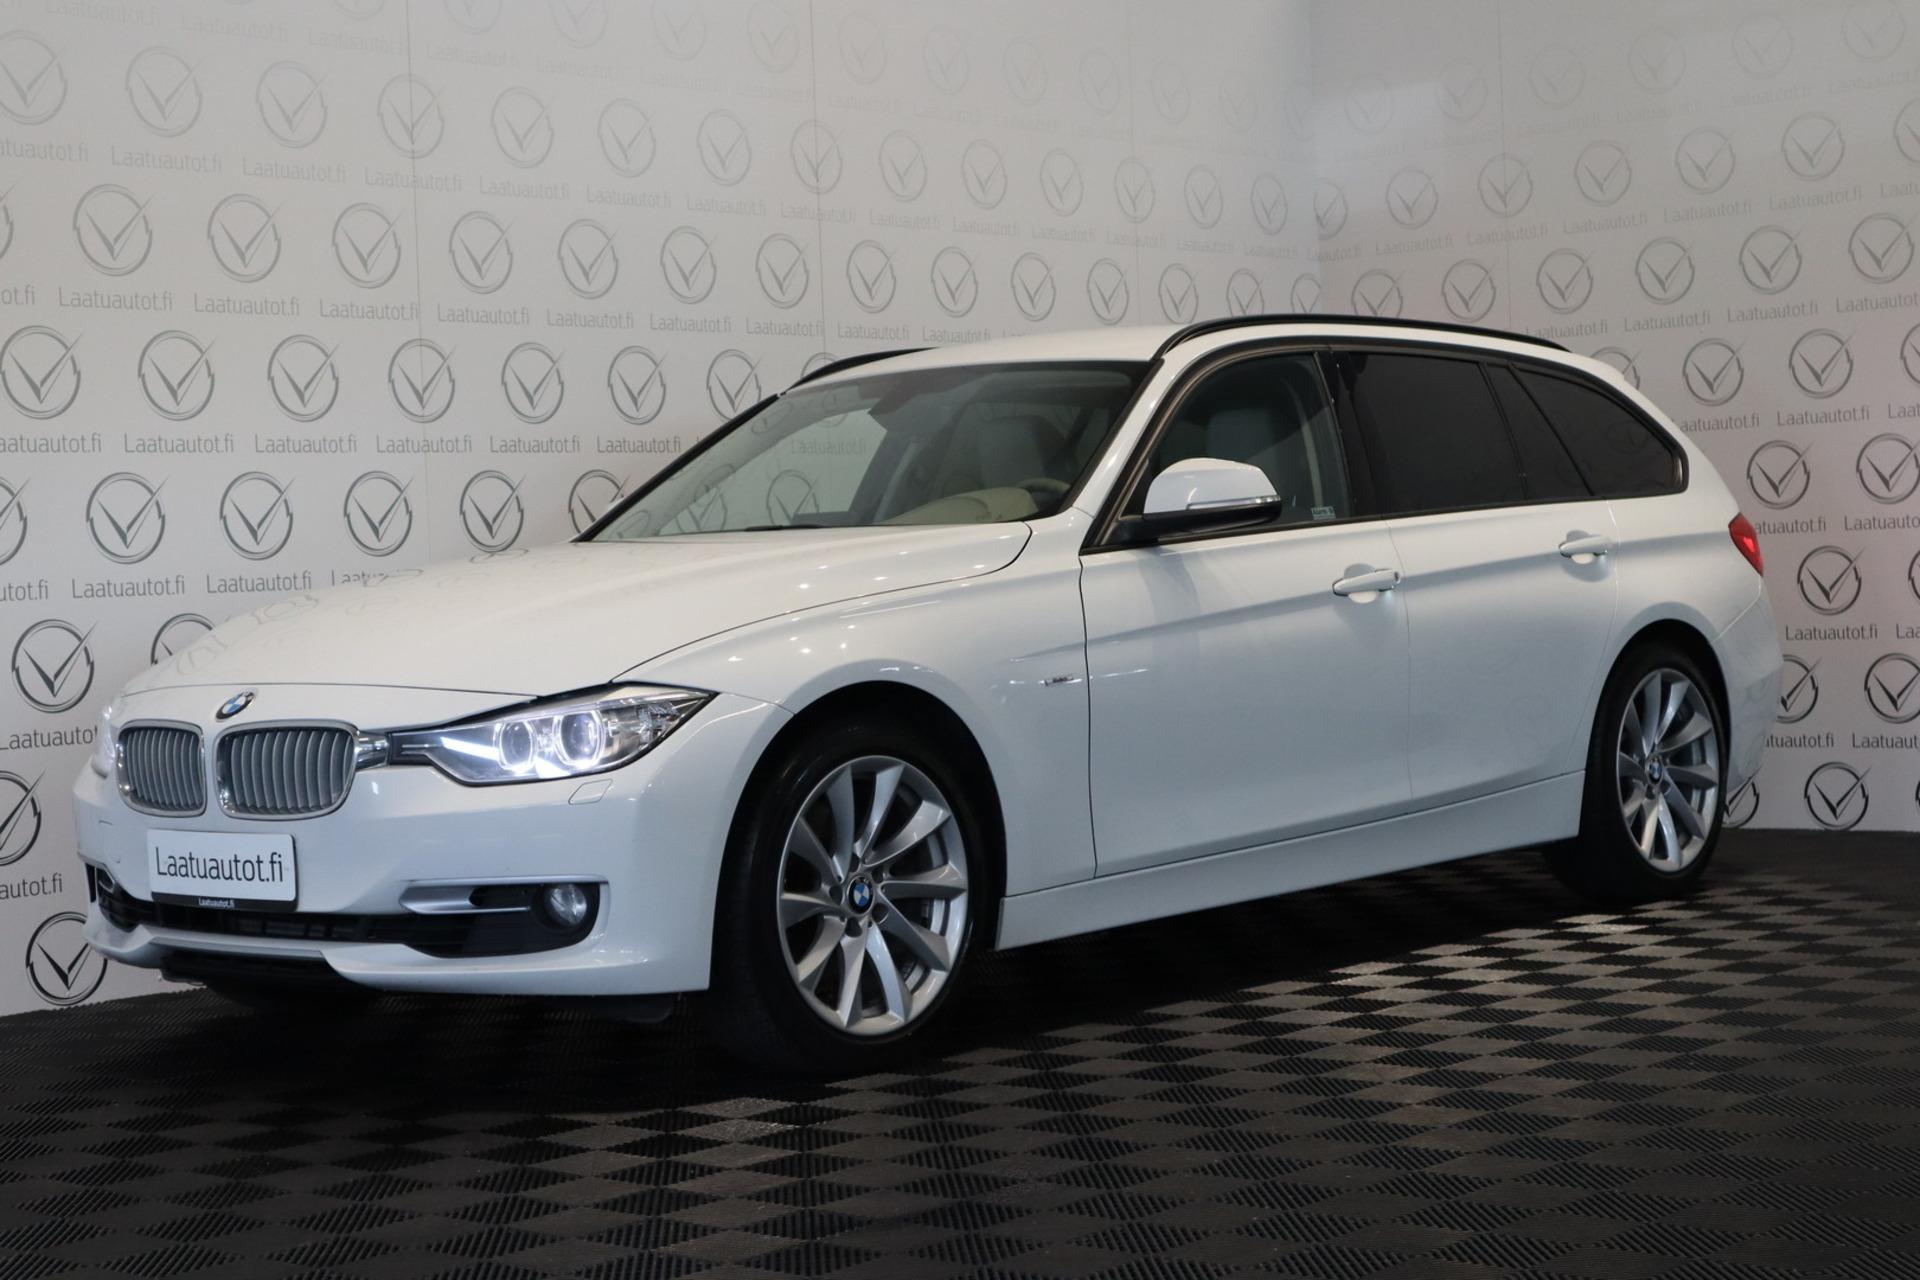 BMW 328 TwinPower Turbo A F31 Touring Business Modern - Korko 1, 89%,  Jopa ilman käsirahaa! Xenon,  Cruise,  AutoAC,  Bluetooth,  PDC!